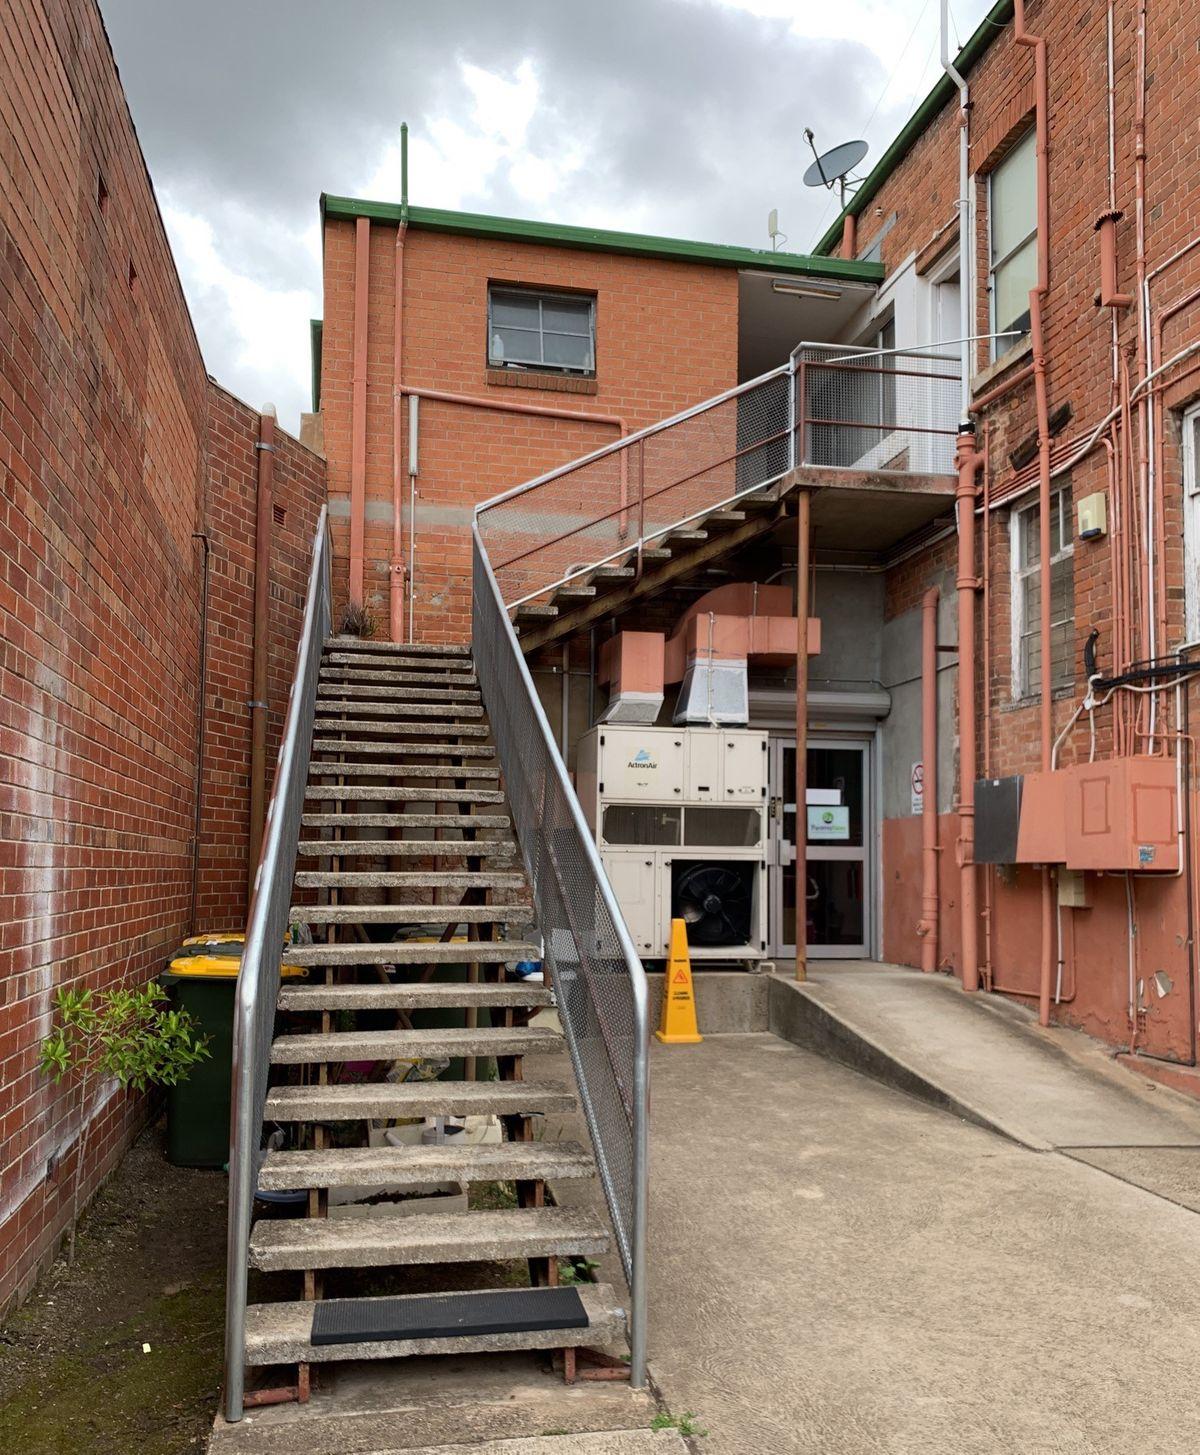 3/153 George Street, Bathurst, NSW 2795